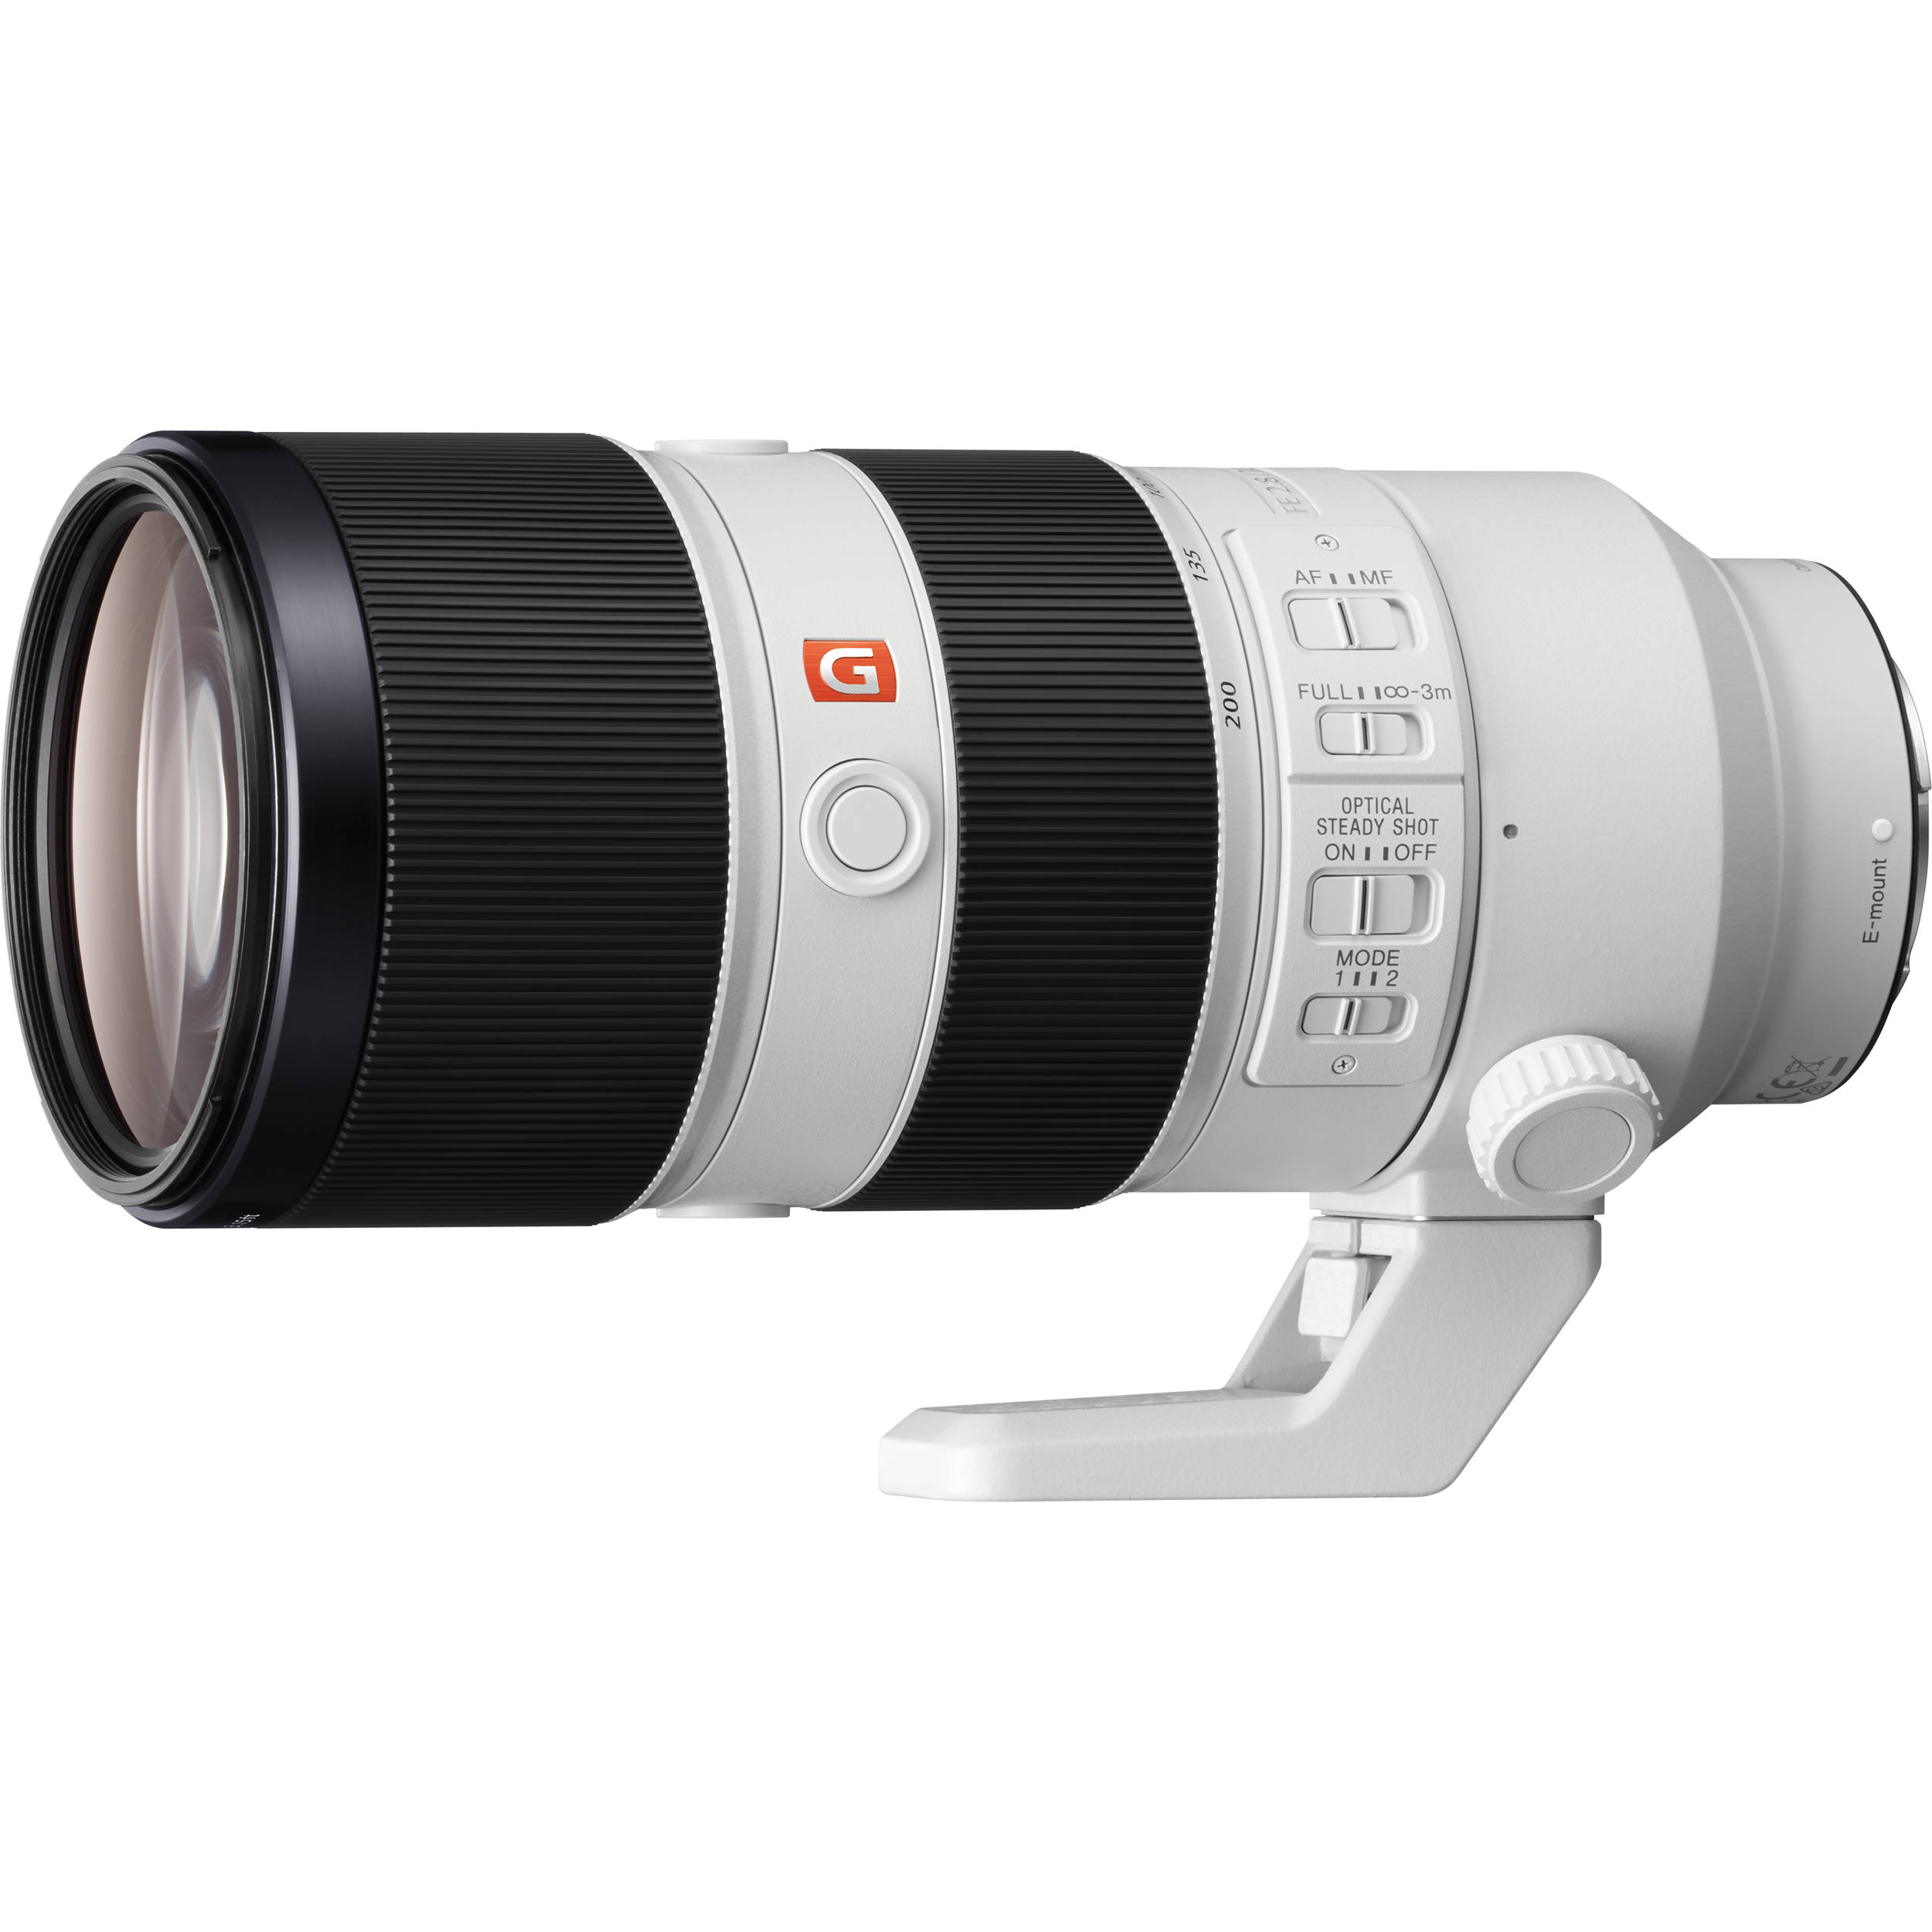 Sony 70-200mm F4 Lens